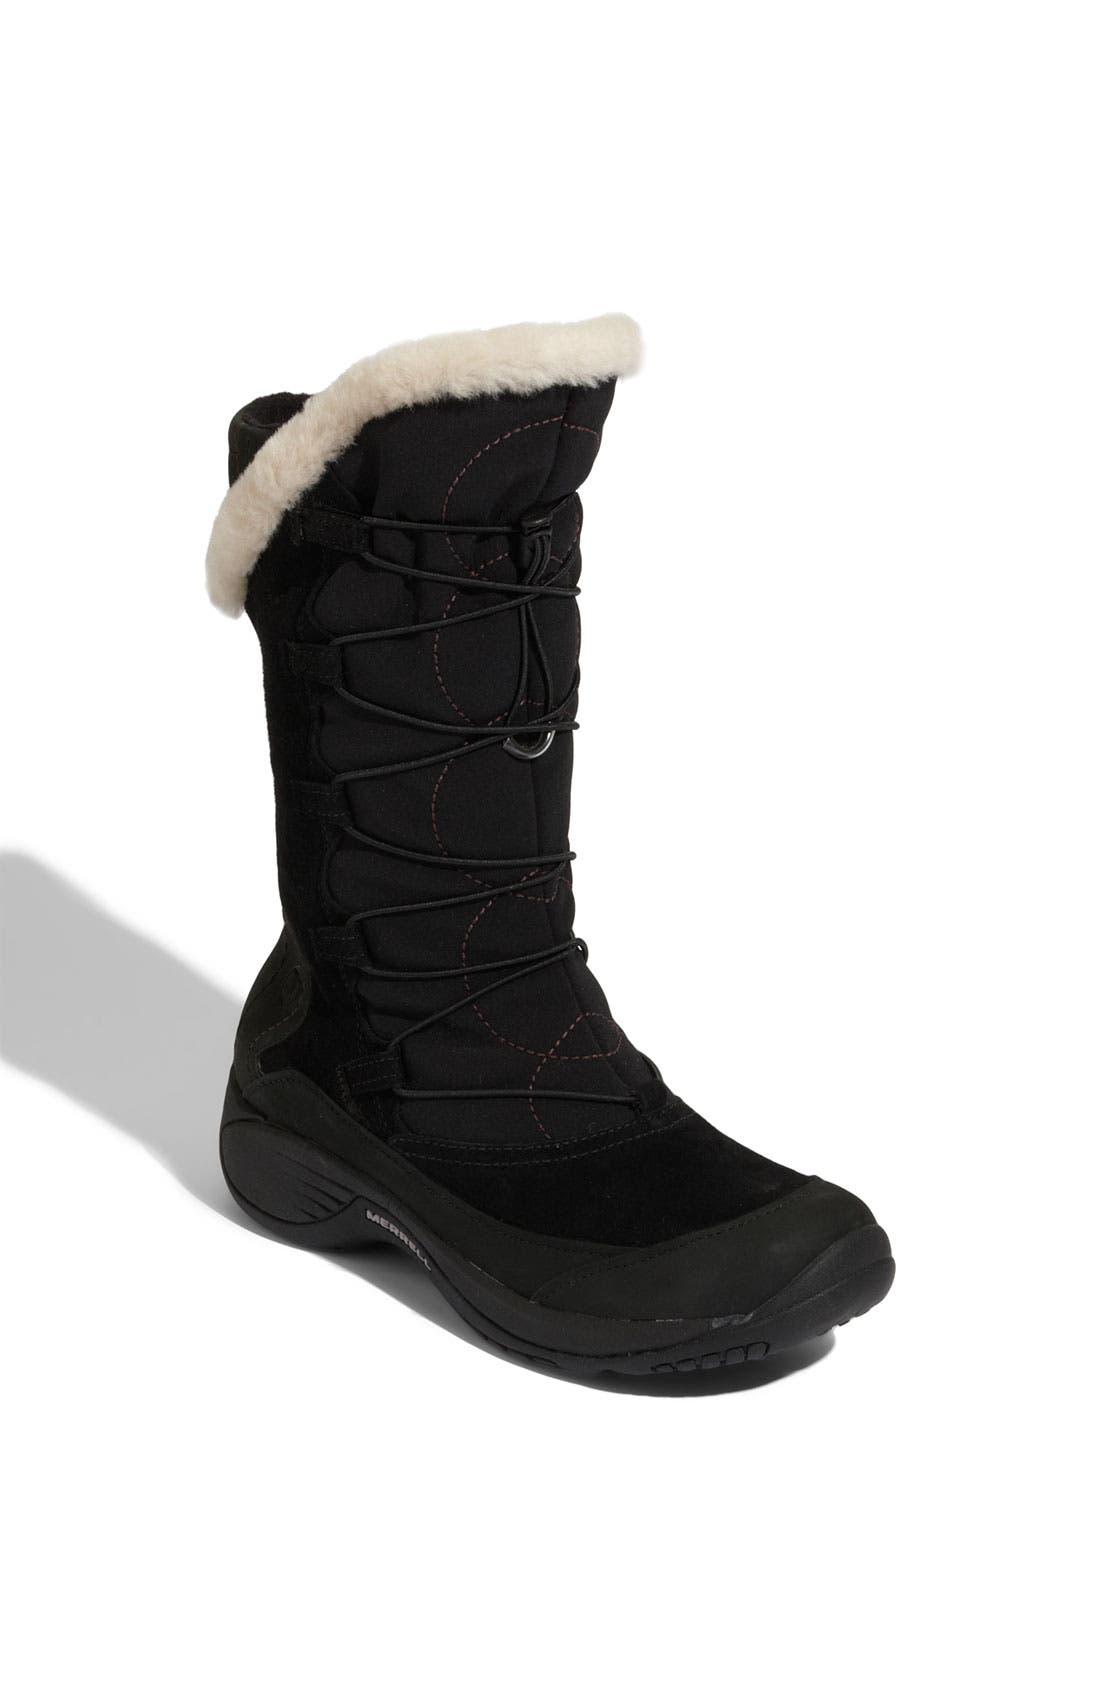 Alternate Image 1 Selected - Merrell 'Encore Apex' Boot